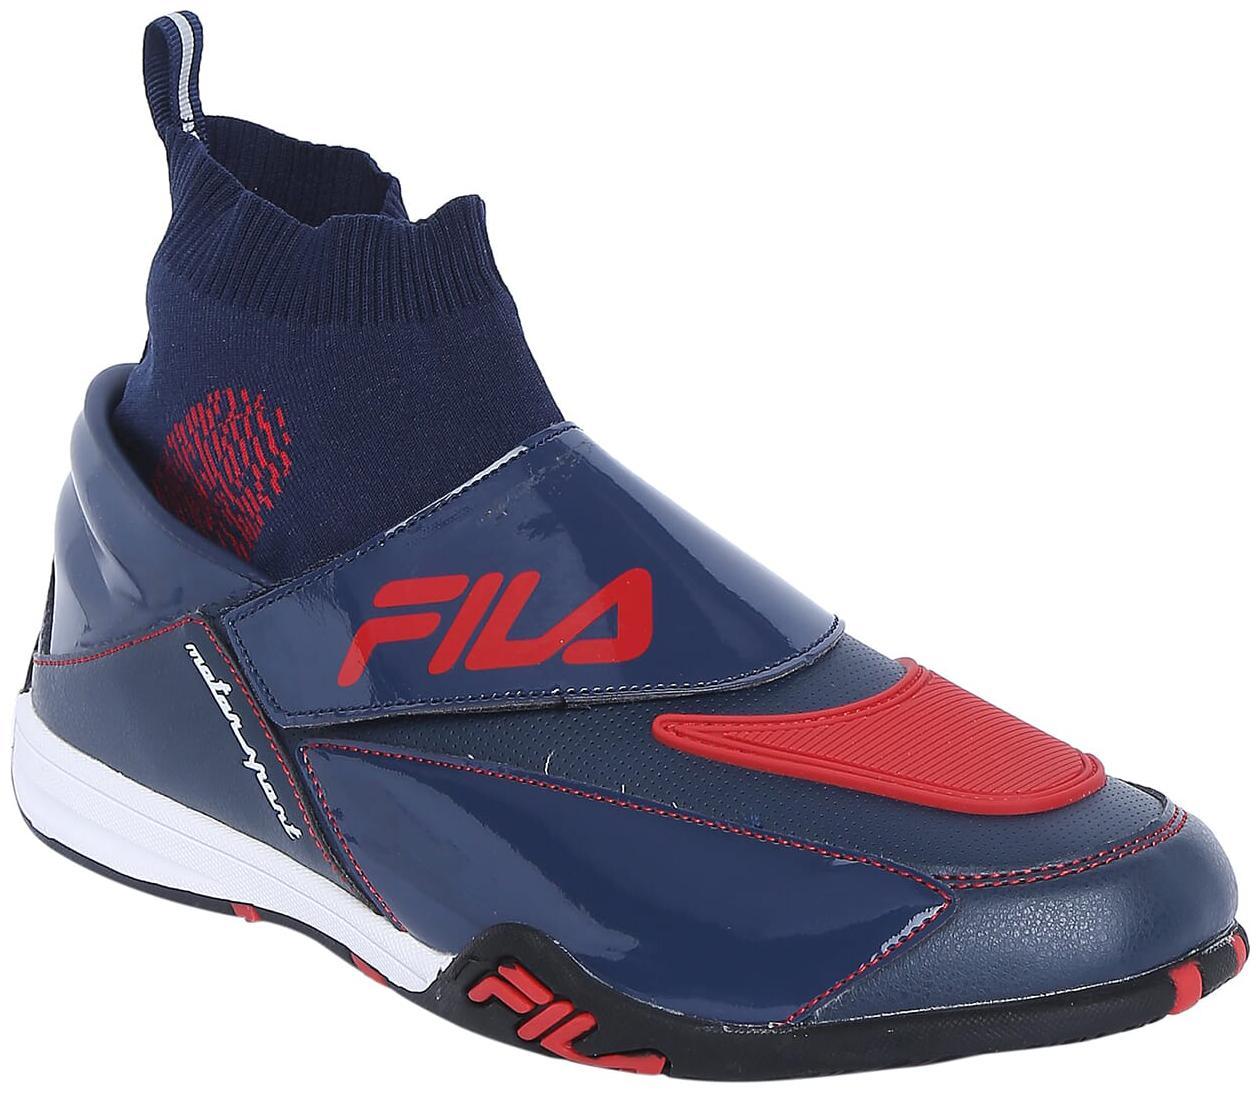 Fila Men TAILFIN Riding Shoes ( Blue